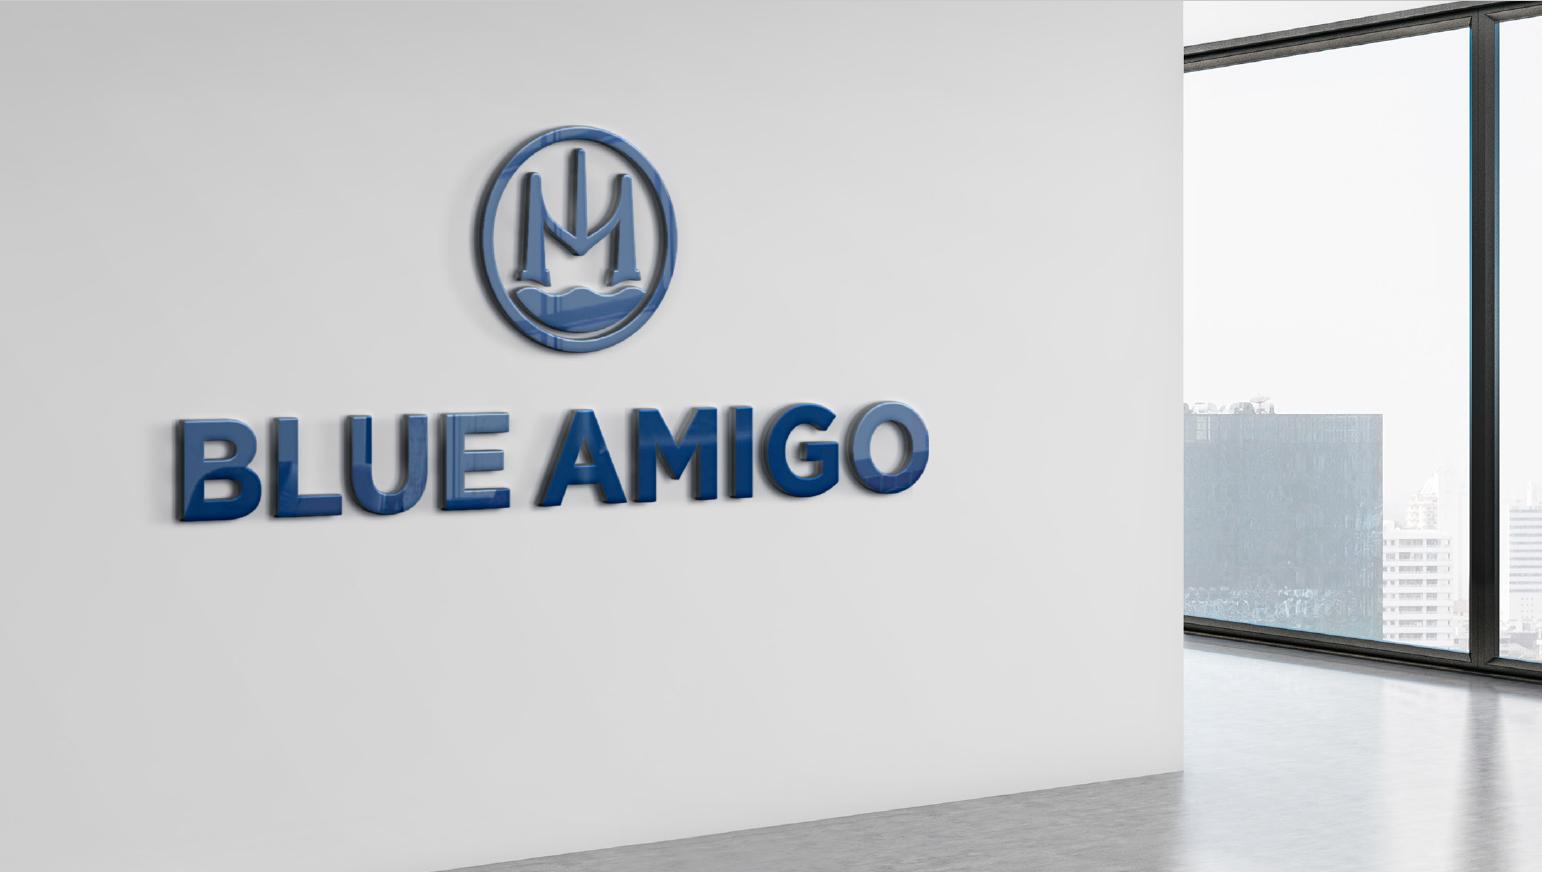 Swets staat vanaf nu bekend als Blue Amigo. (Foto Blue Amigo)